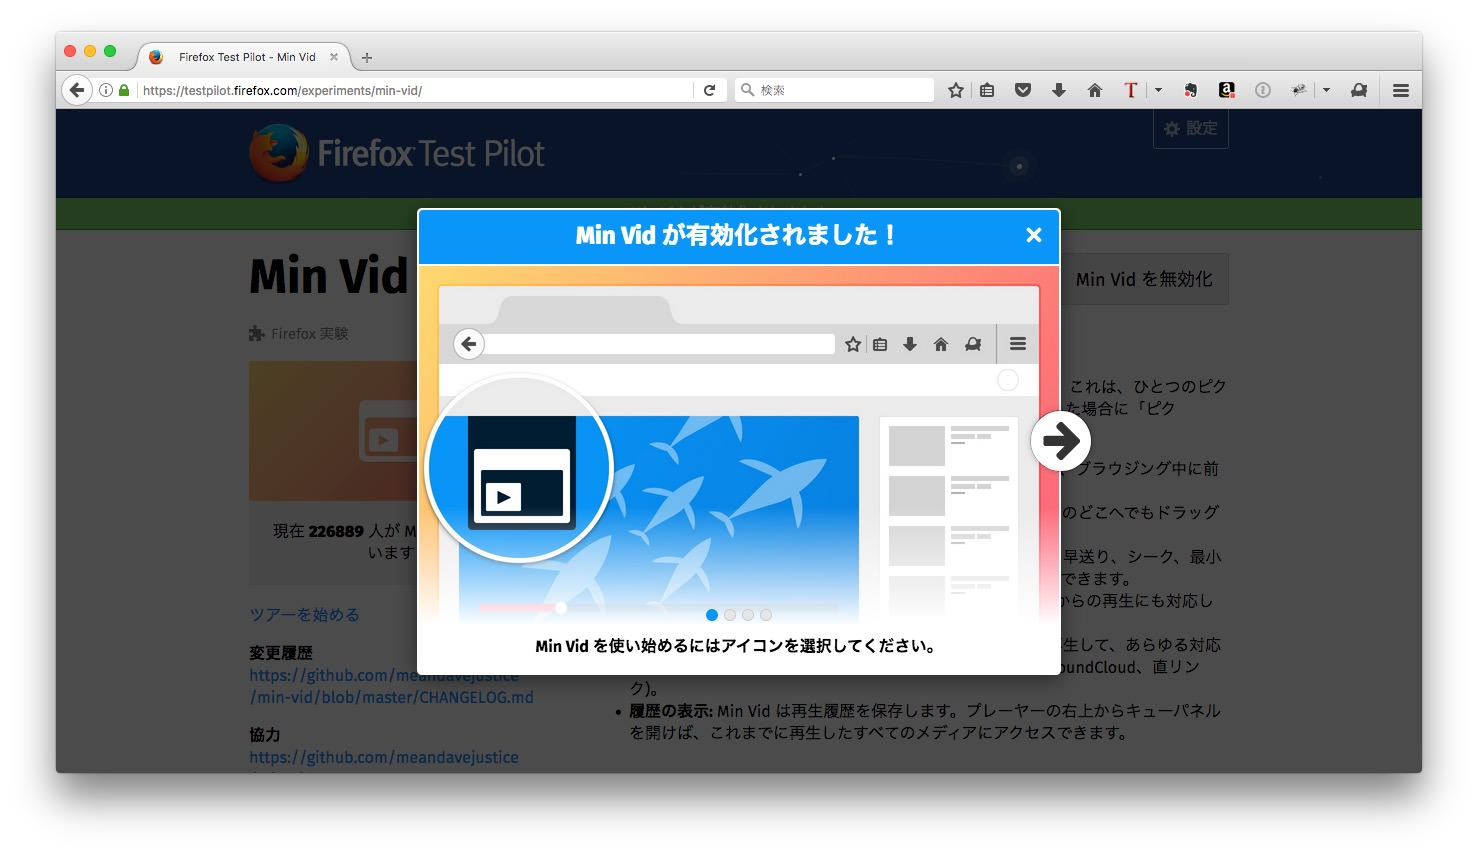 Firefoxの実験的な機能YouTubeなどをピクチャー・イン・ピクチャーできる「Min Vid」が最高な件